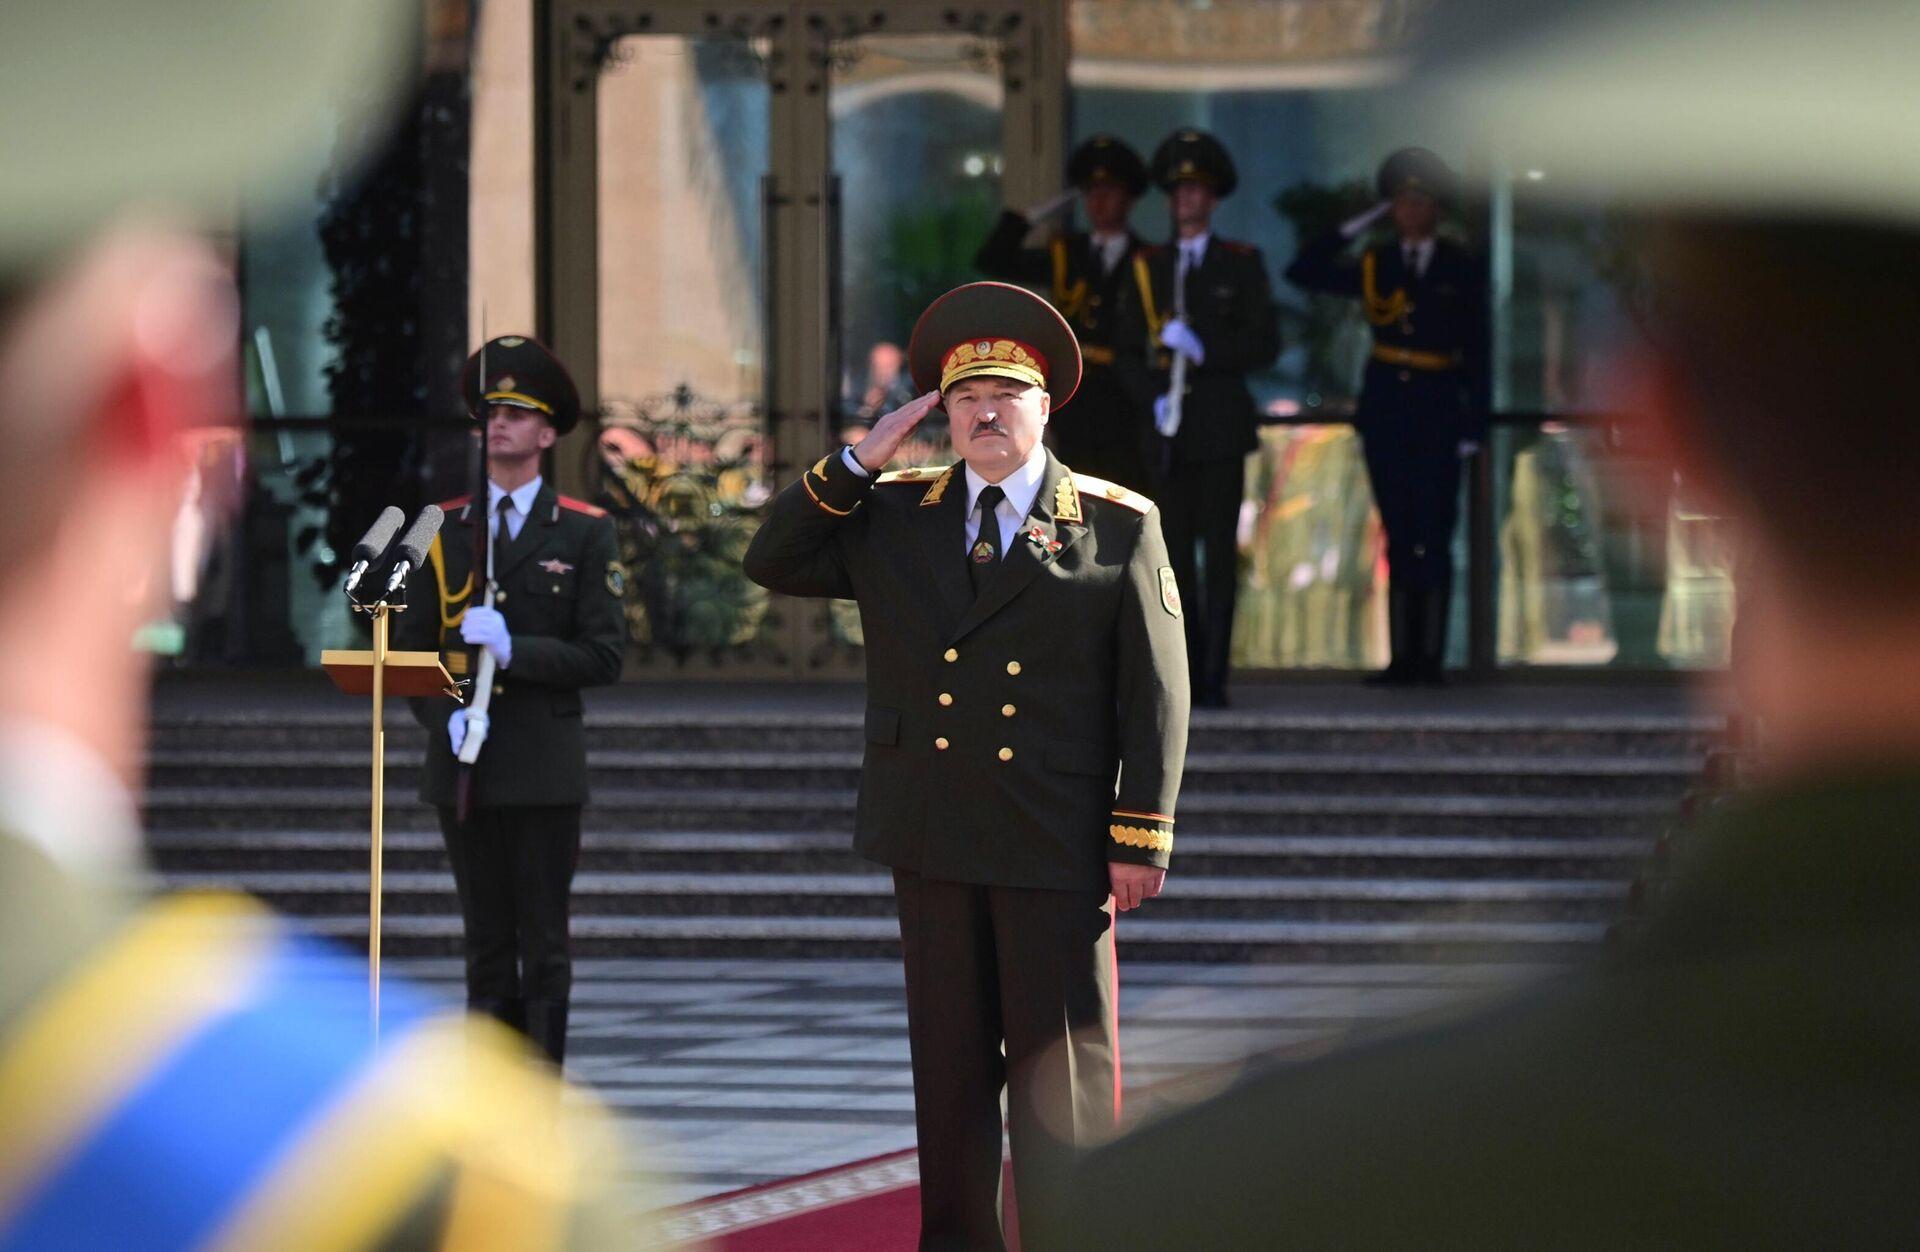 Президент Белоруссии Александр Лукашенко после завершения церемонии инаугурации в Минске - РИА Новости, 1920, 24.09.2020